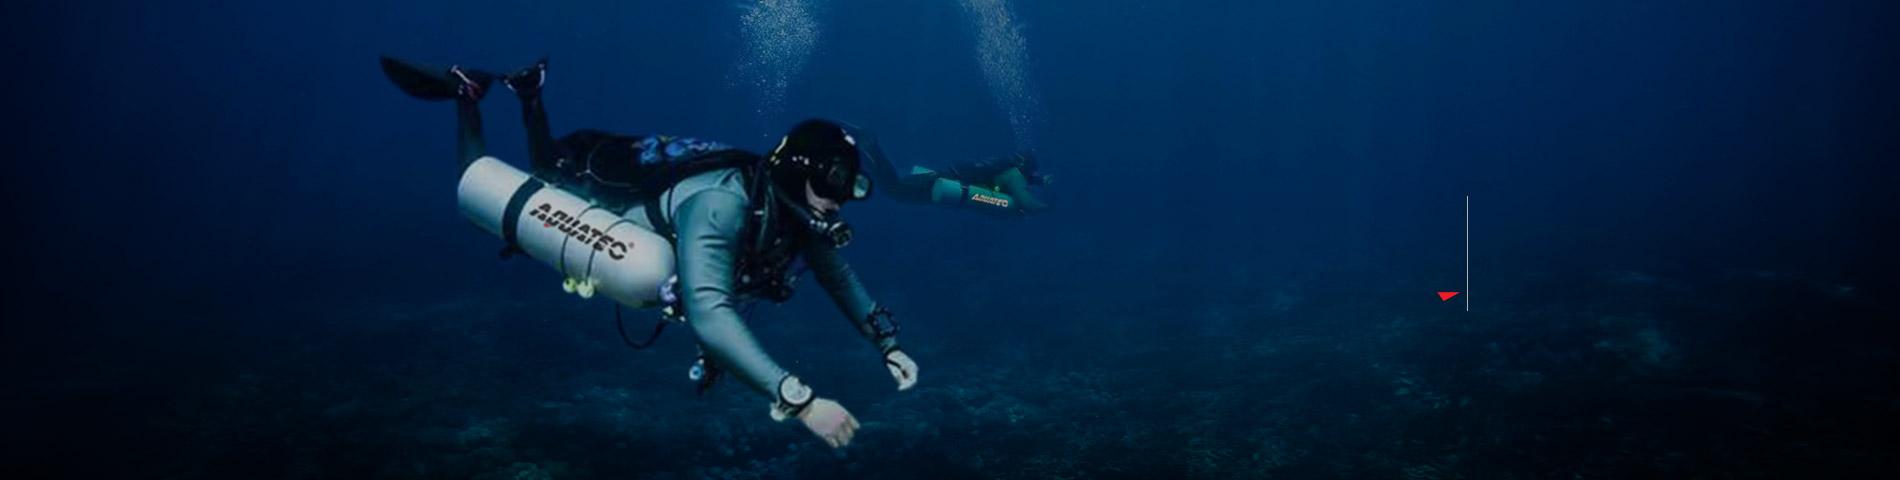 AQUATEC 专业潜水设备生产制造